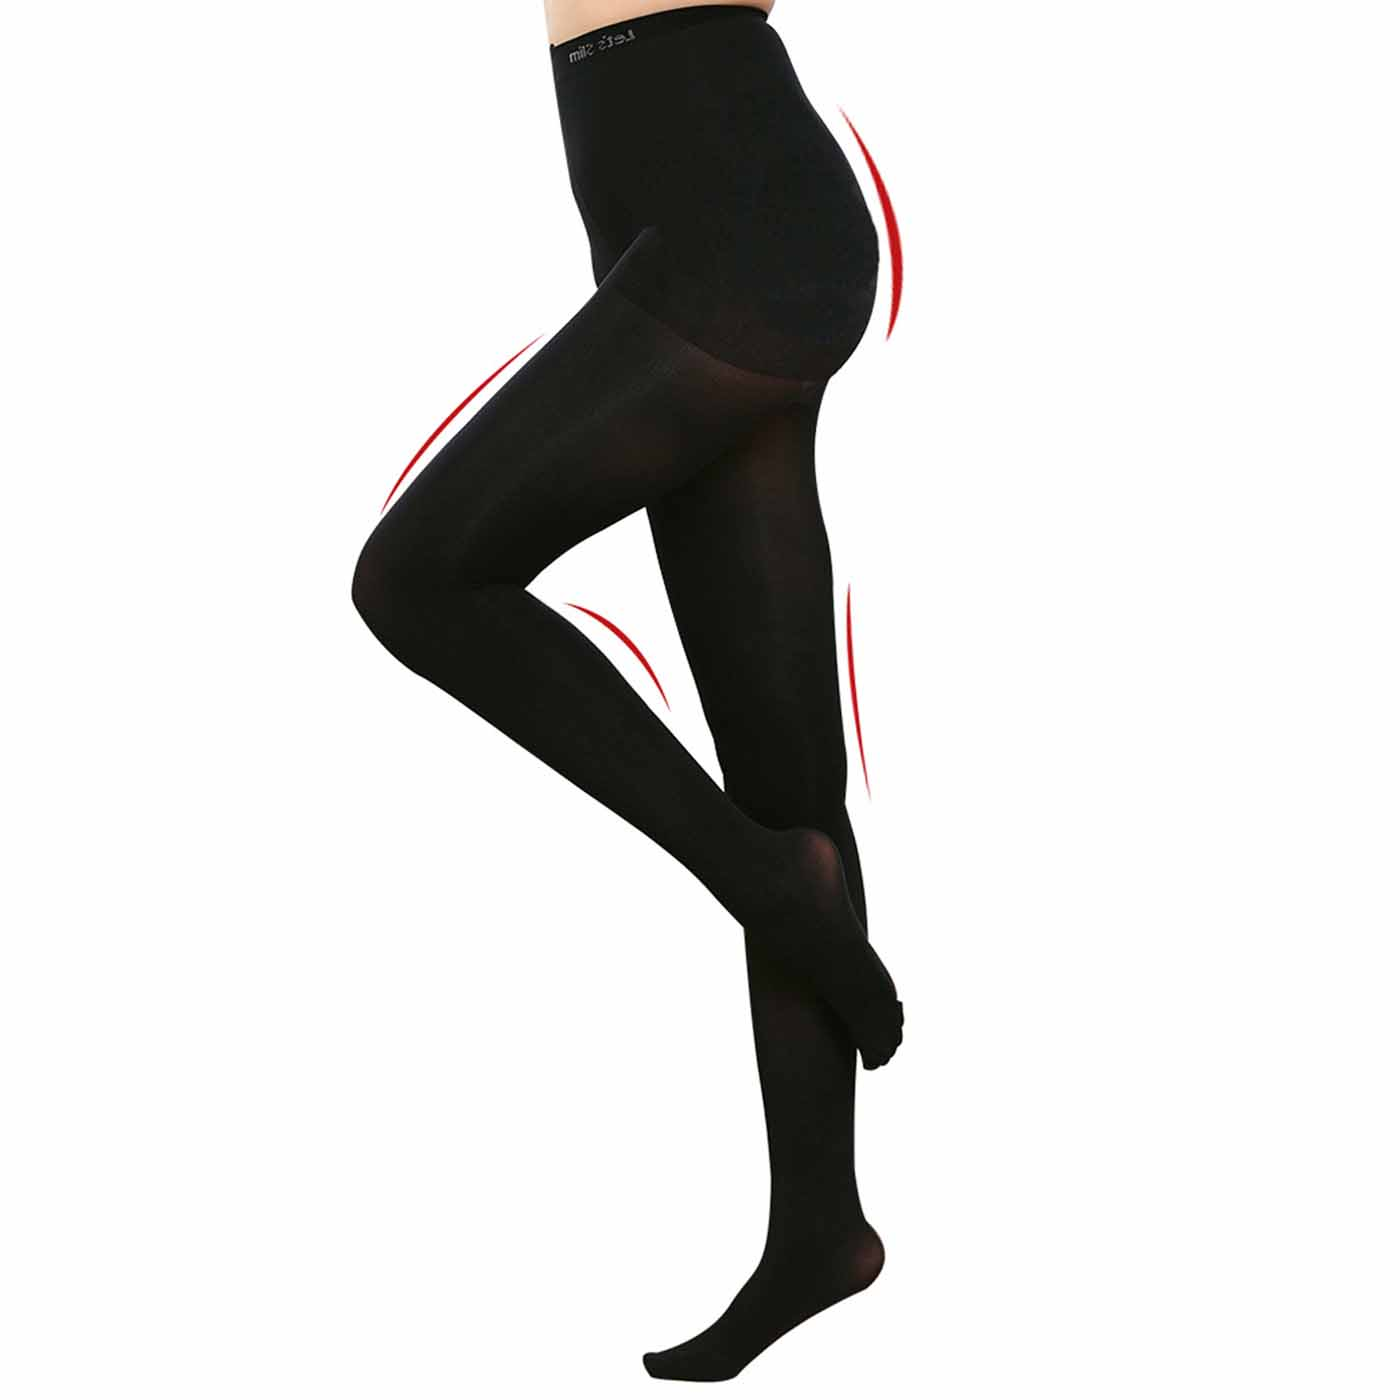 Varicose Veins Socks Slimming Stockings Compression Burn Fat Super Thin Sleeping Overnight Slim legging Patch Beauty Leg Socks